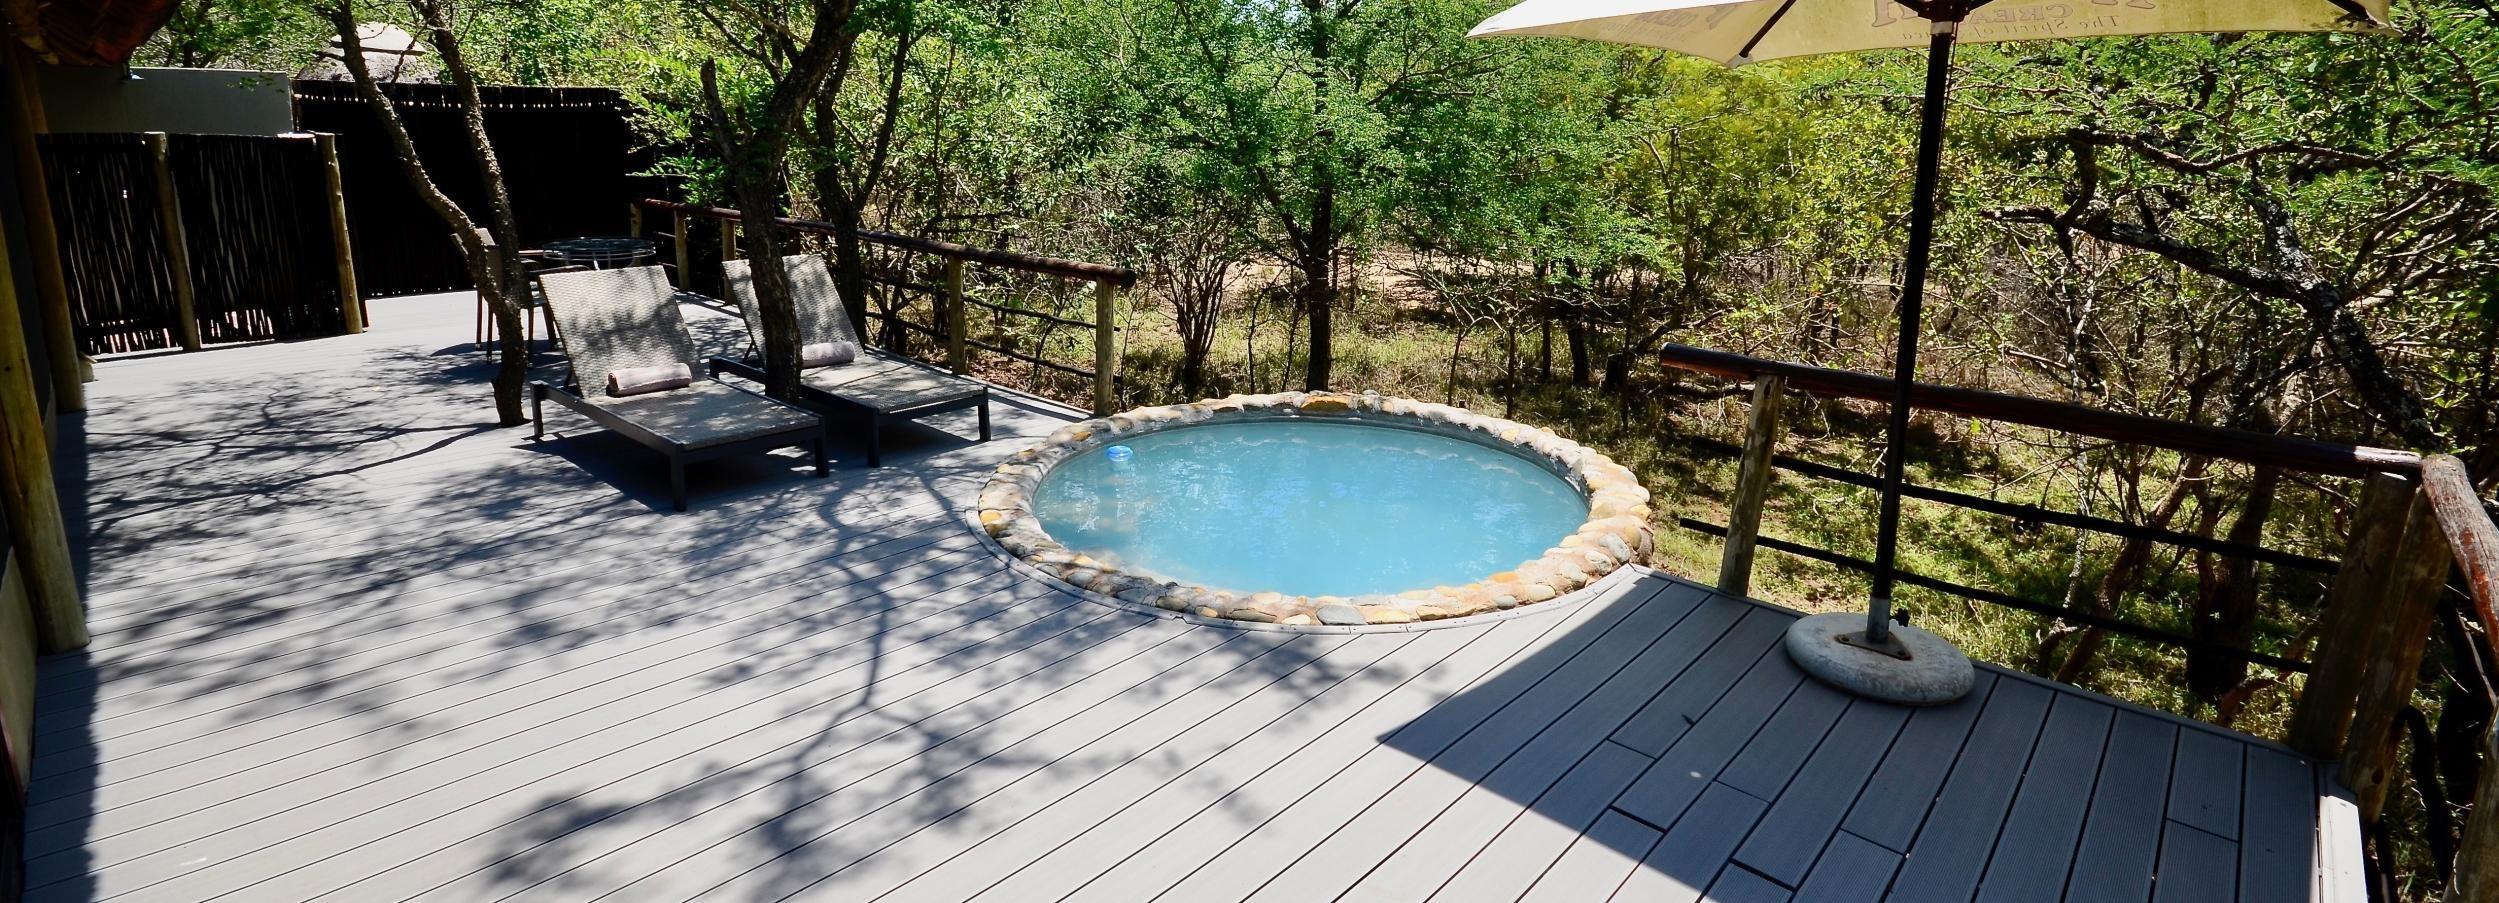 Ab Johannesburg: 5-tägige Safari im Kruger-Nationalpark